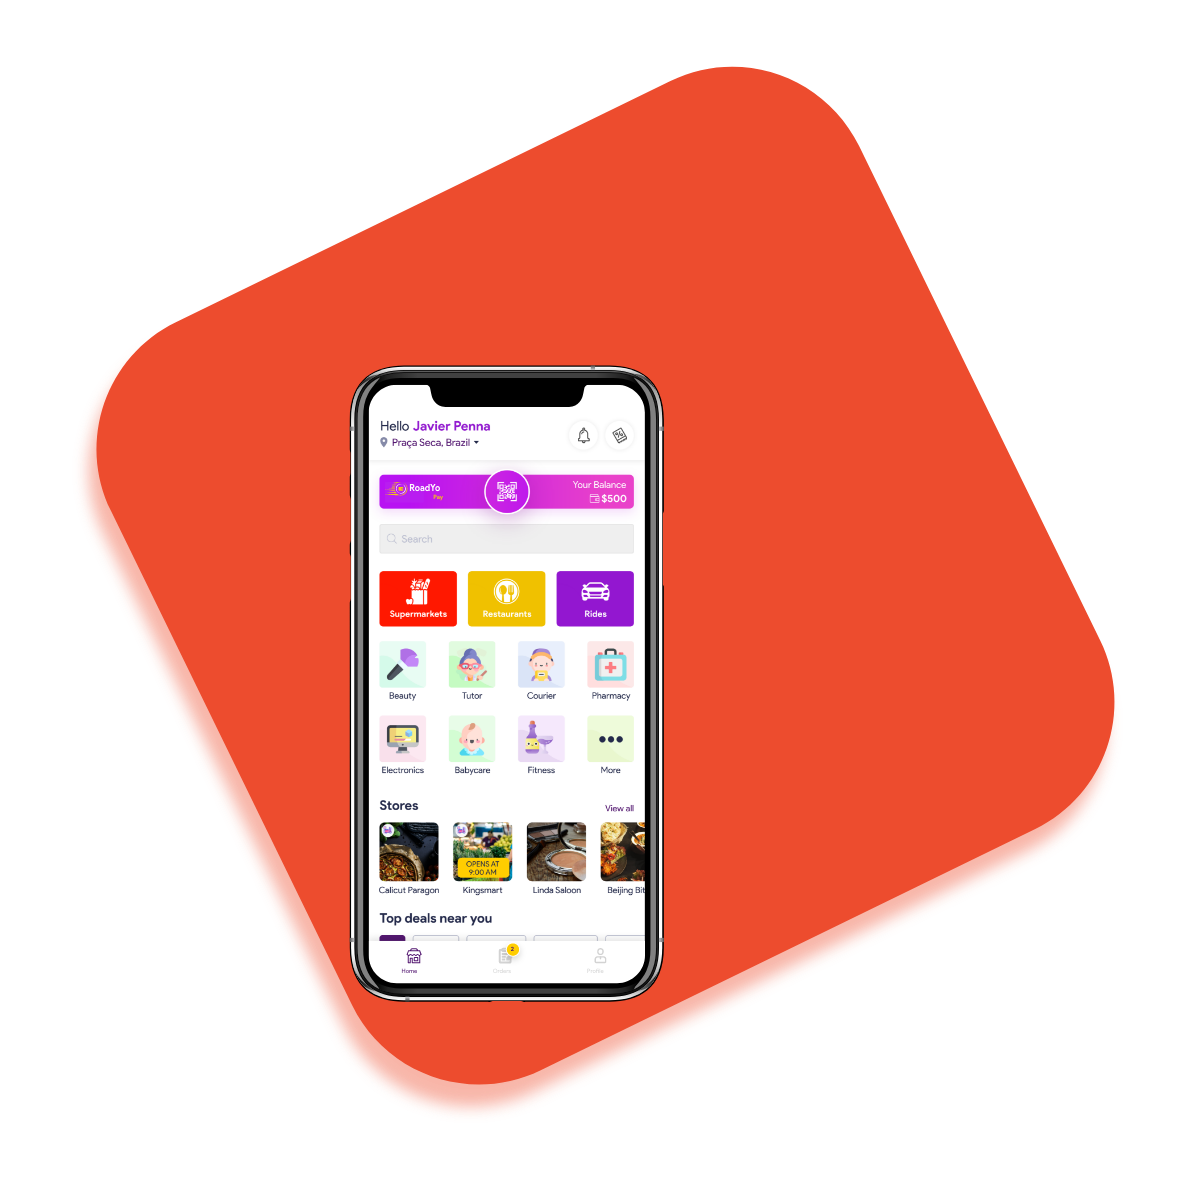 Rappi Like App Development Rappi Like App Development To Develop A Rappi Like Super App